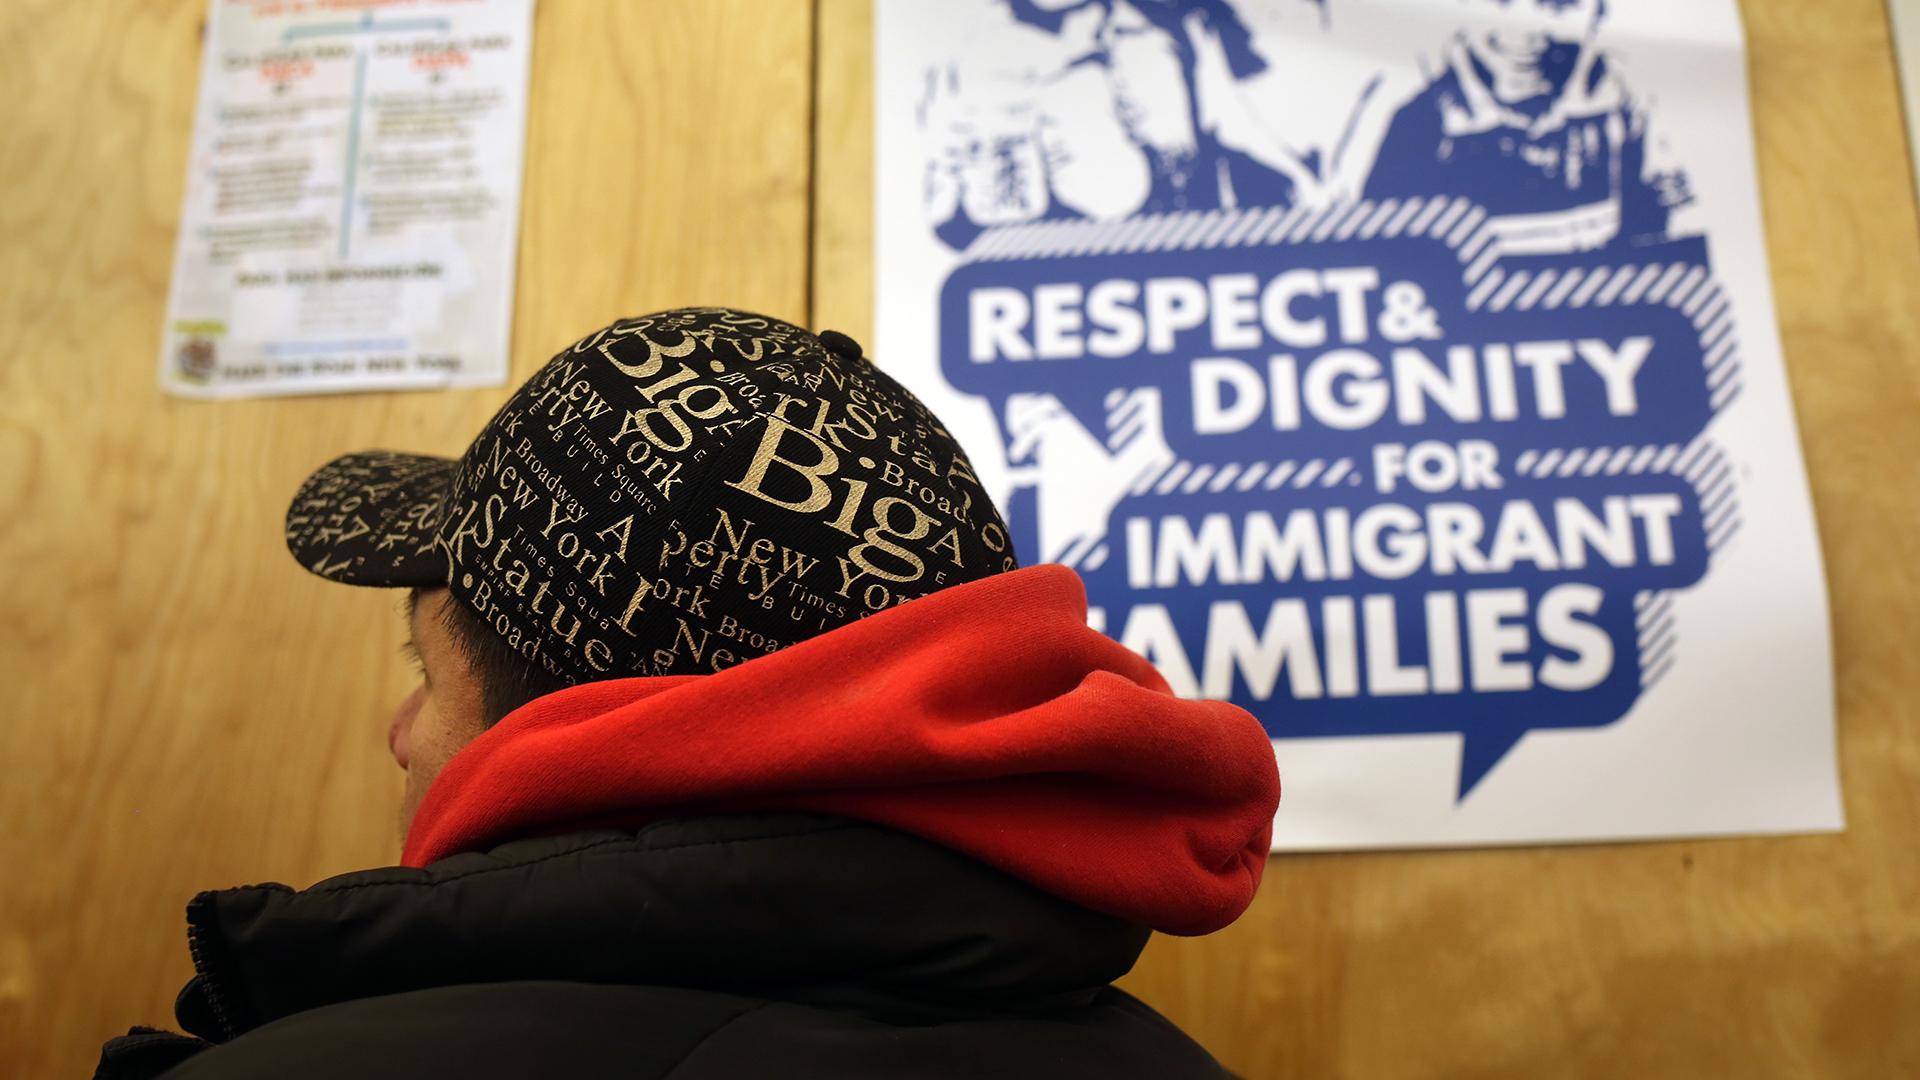 DACA immigrant-159532.jpg68089931